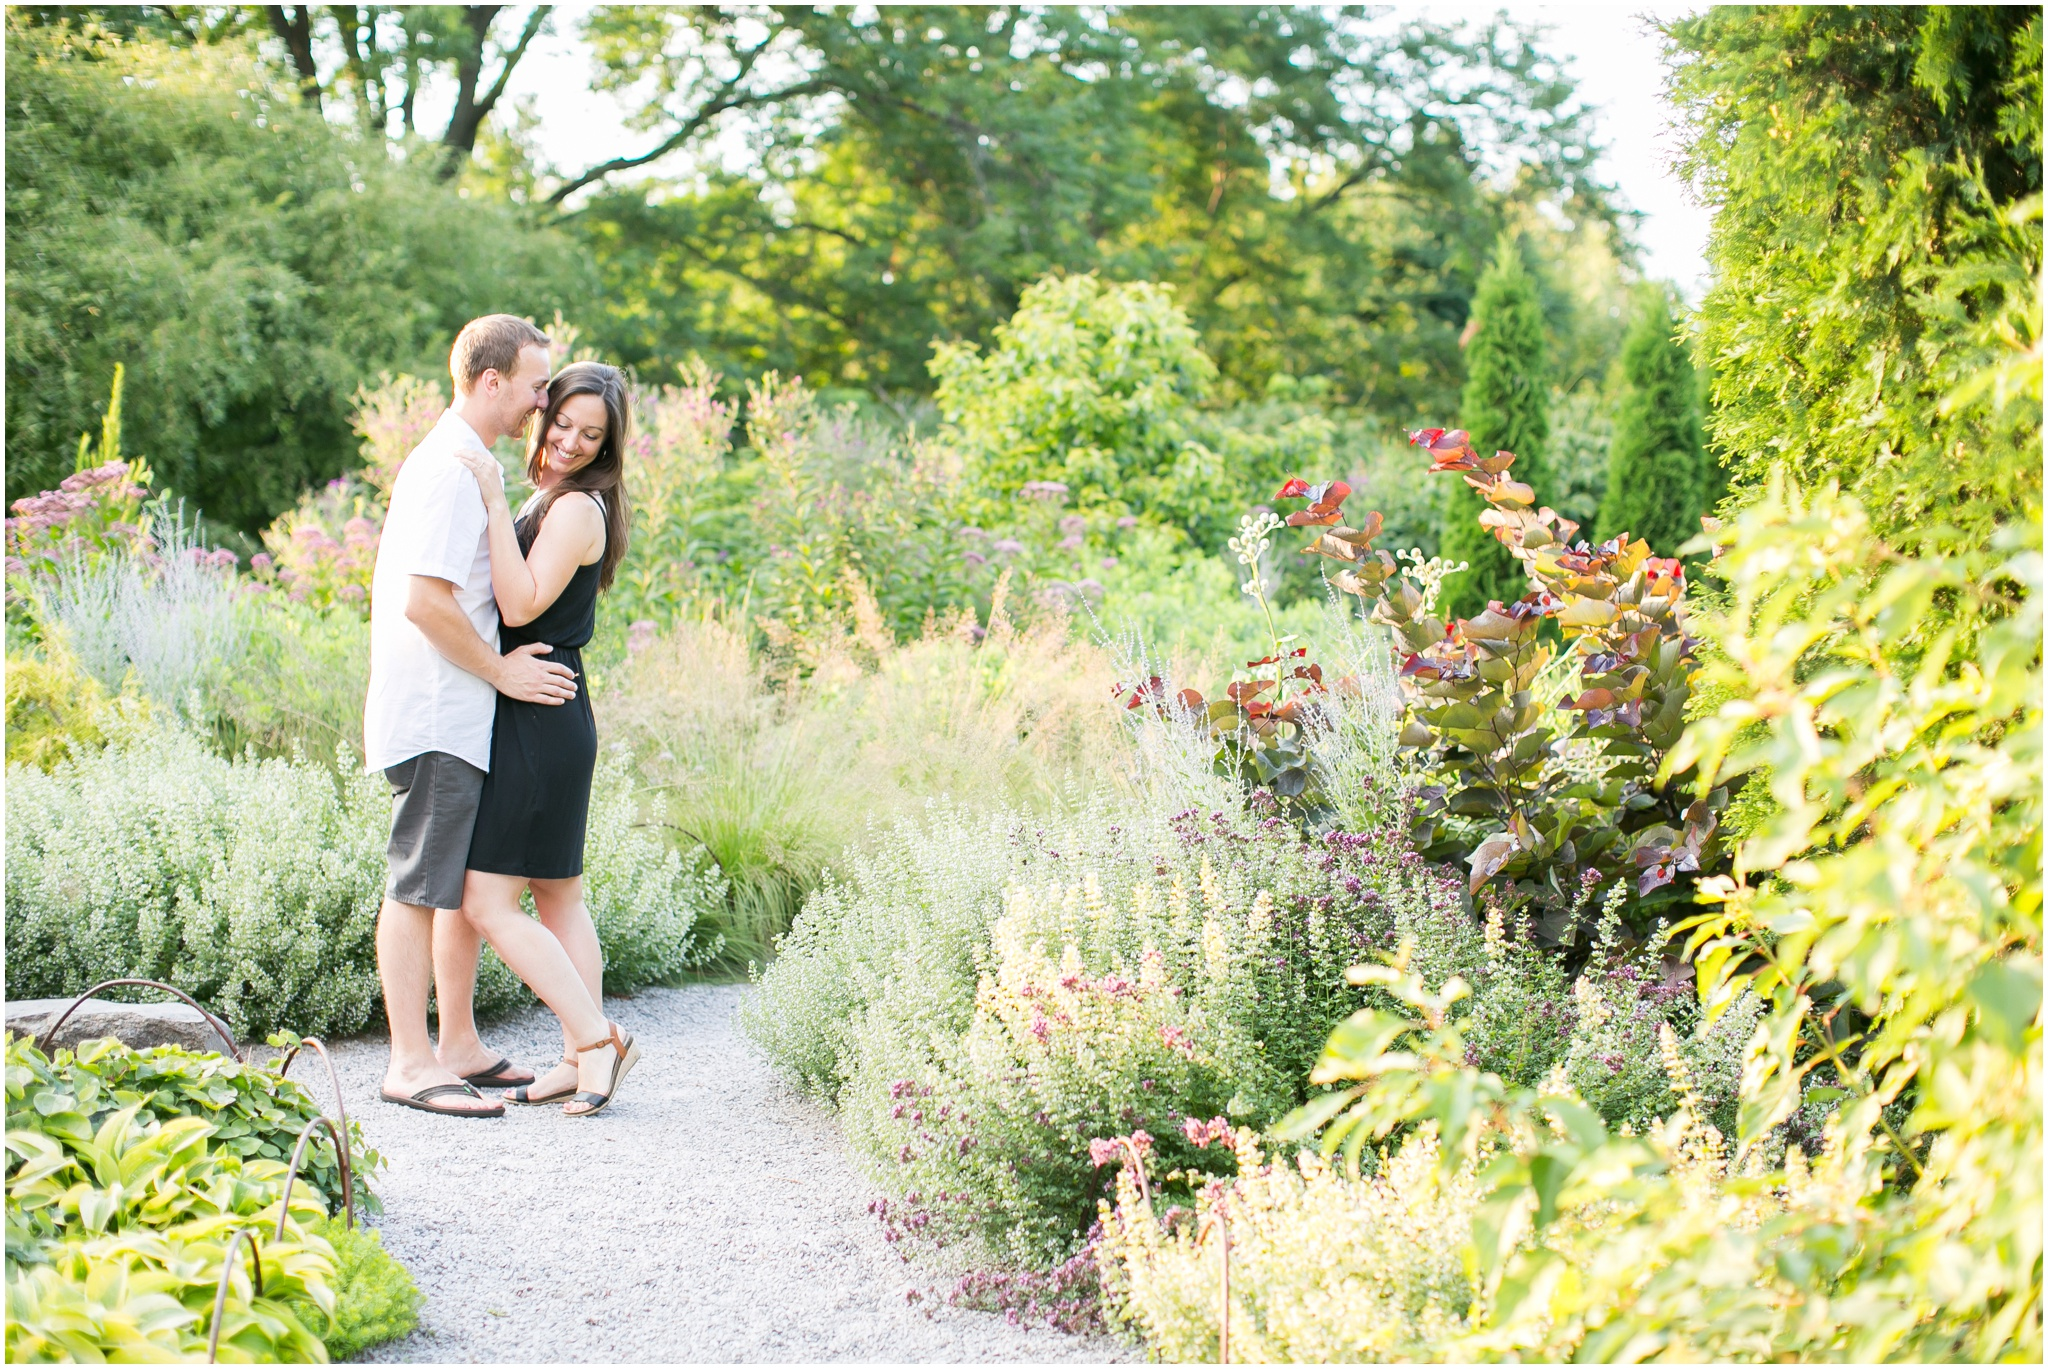 Olbrich_Botanical_Gardens_Madison_Wisconsin_Engagement_Session_0825.jpg